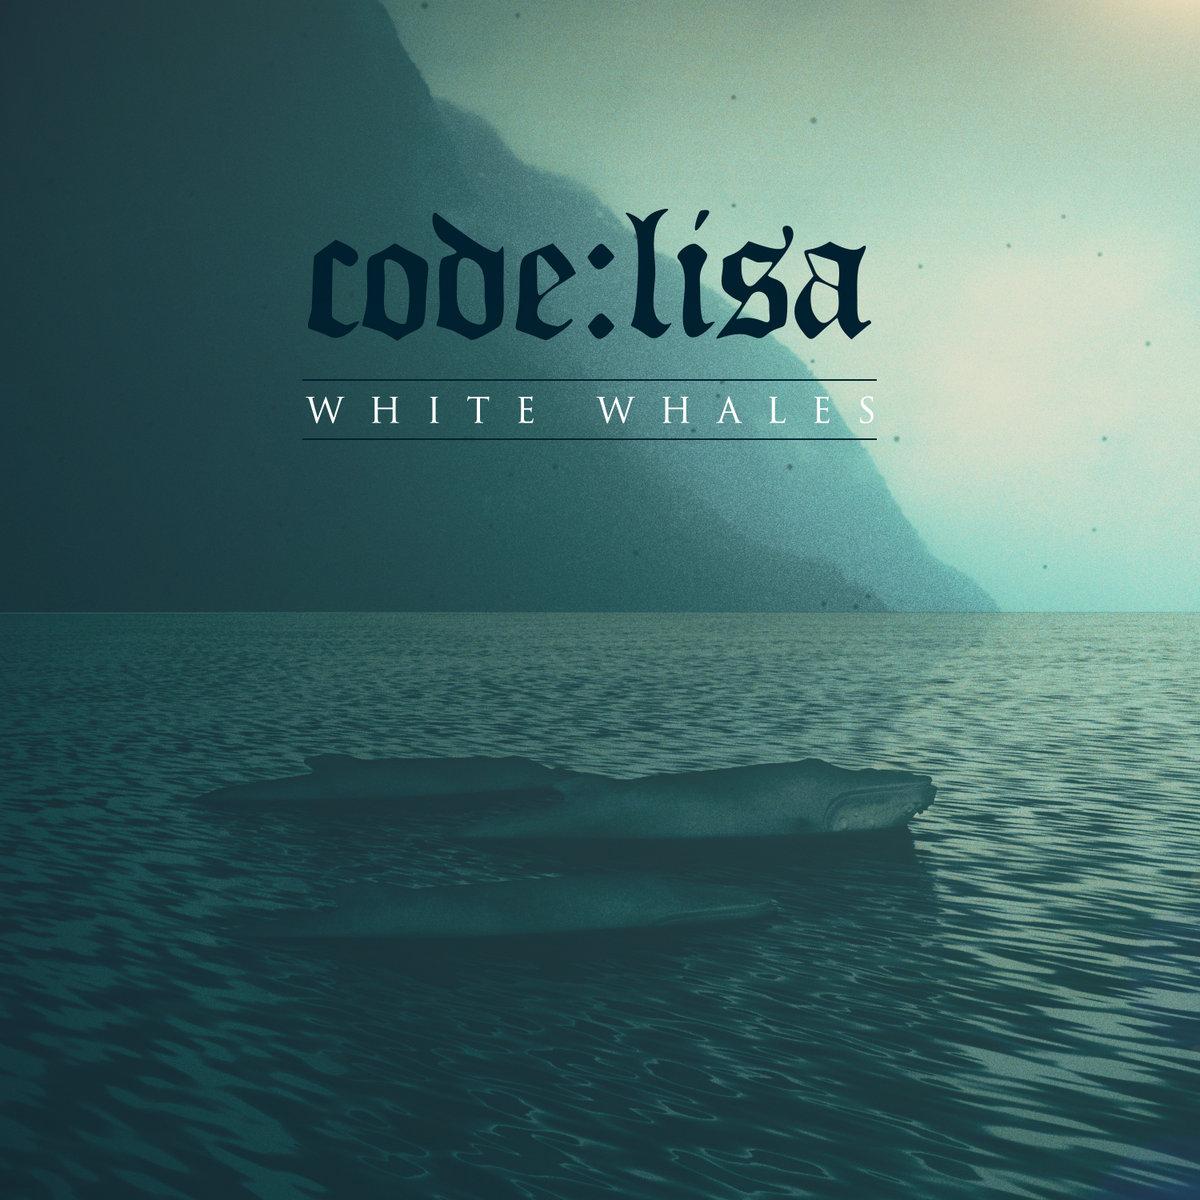 https://codelisa.bandcamp.com/album/white-whales